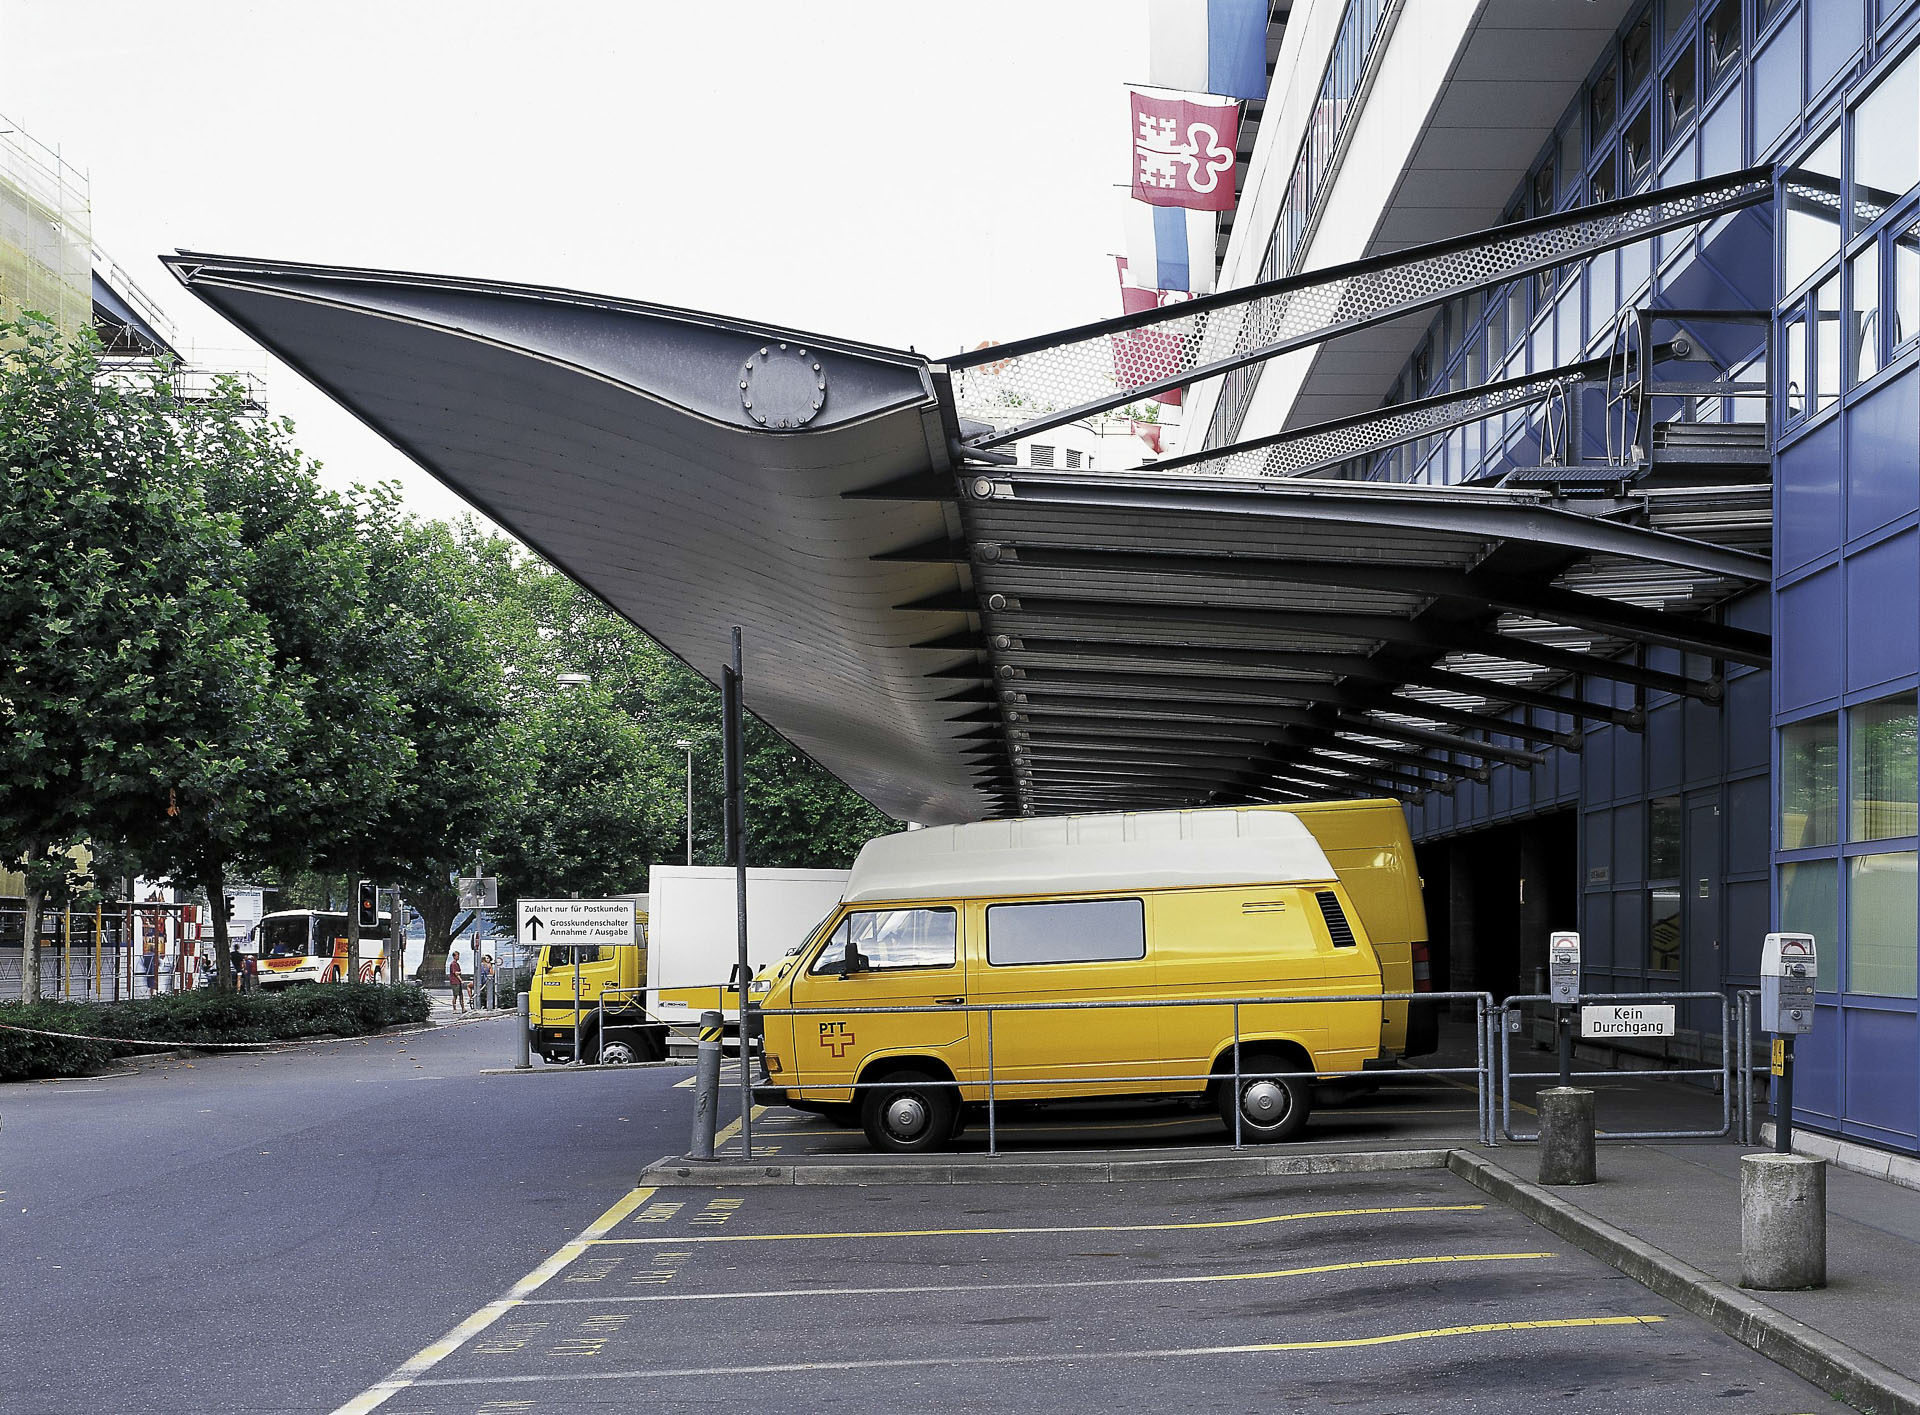 PTT Postal Centre Canopy / Luzern (Gallery) - Santiago Calatrava u2013 Architects u0026 Engineers & PTT Postal Centre Canopy / Luzern (Gallery) - Santiago Calatrava ...